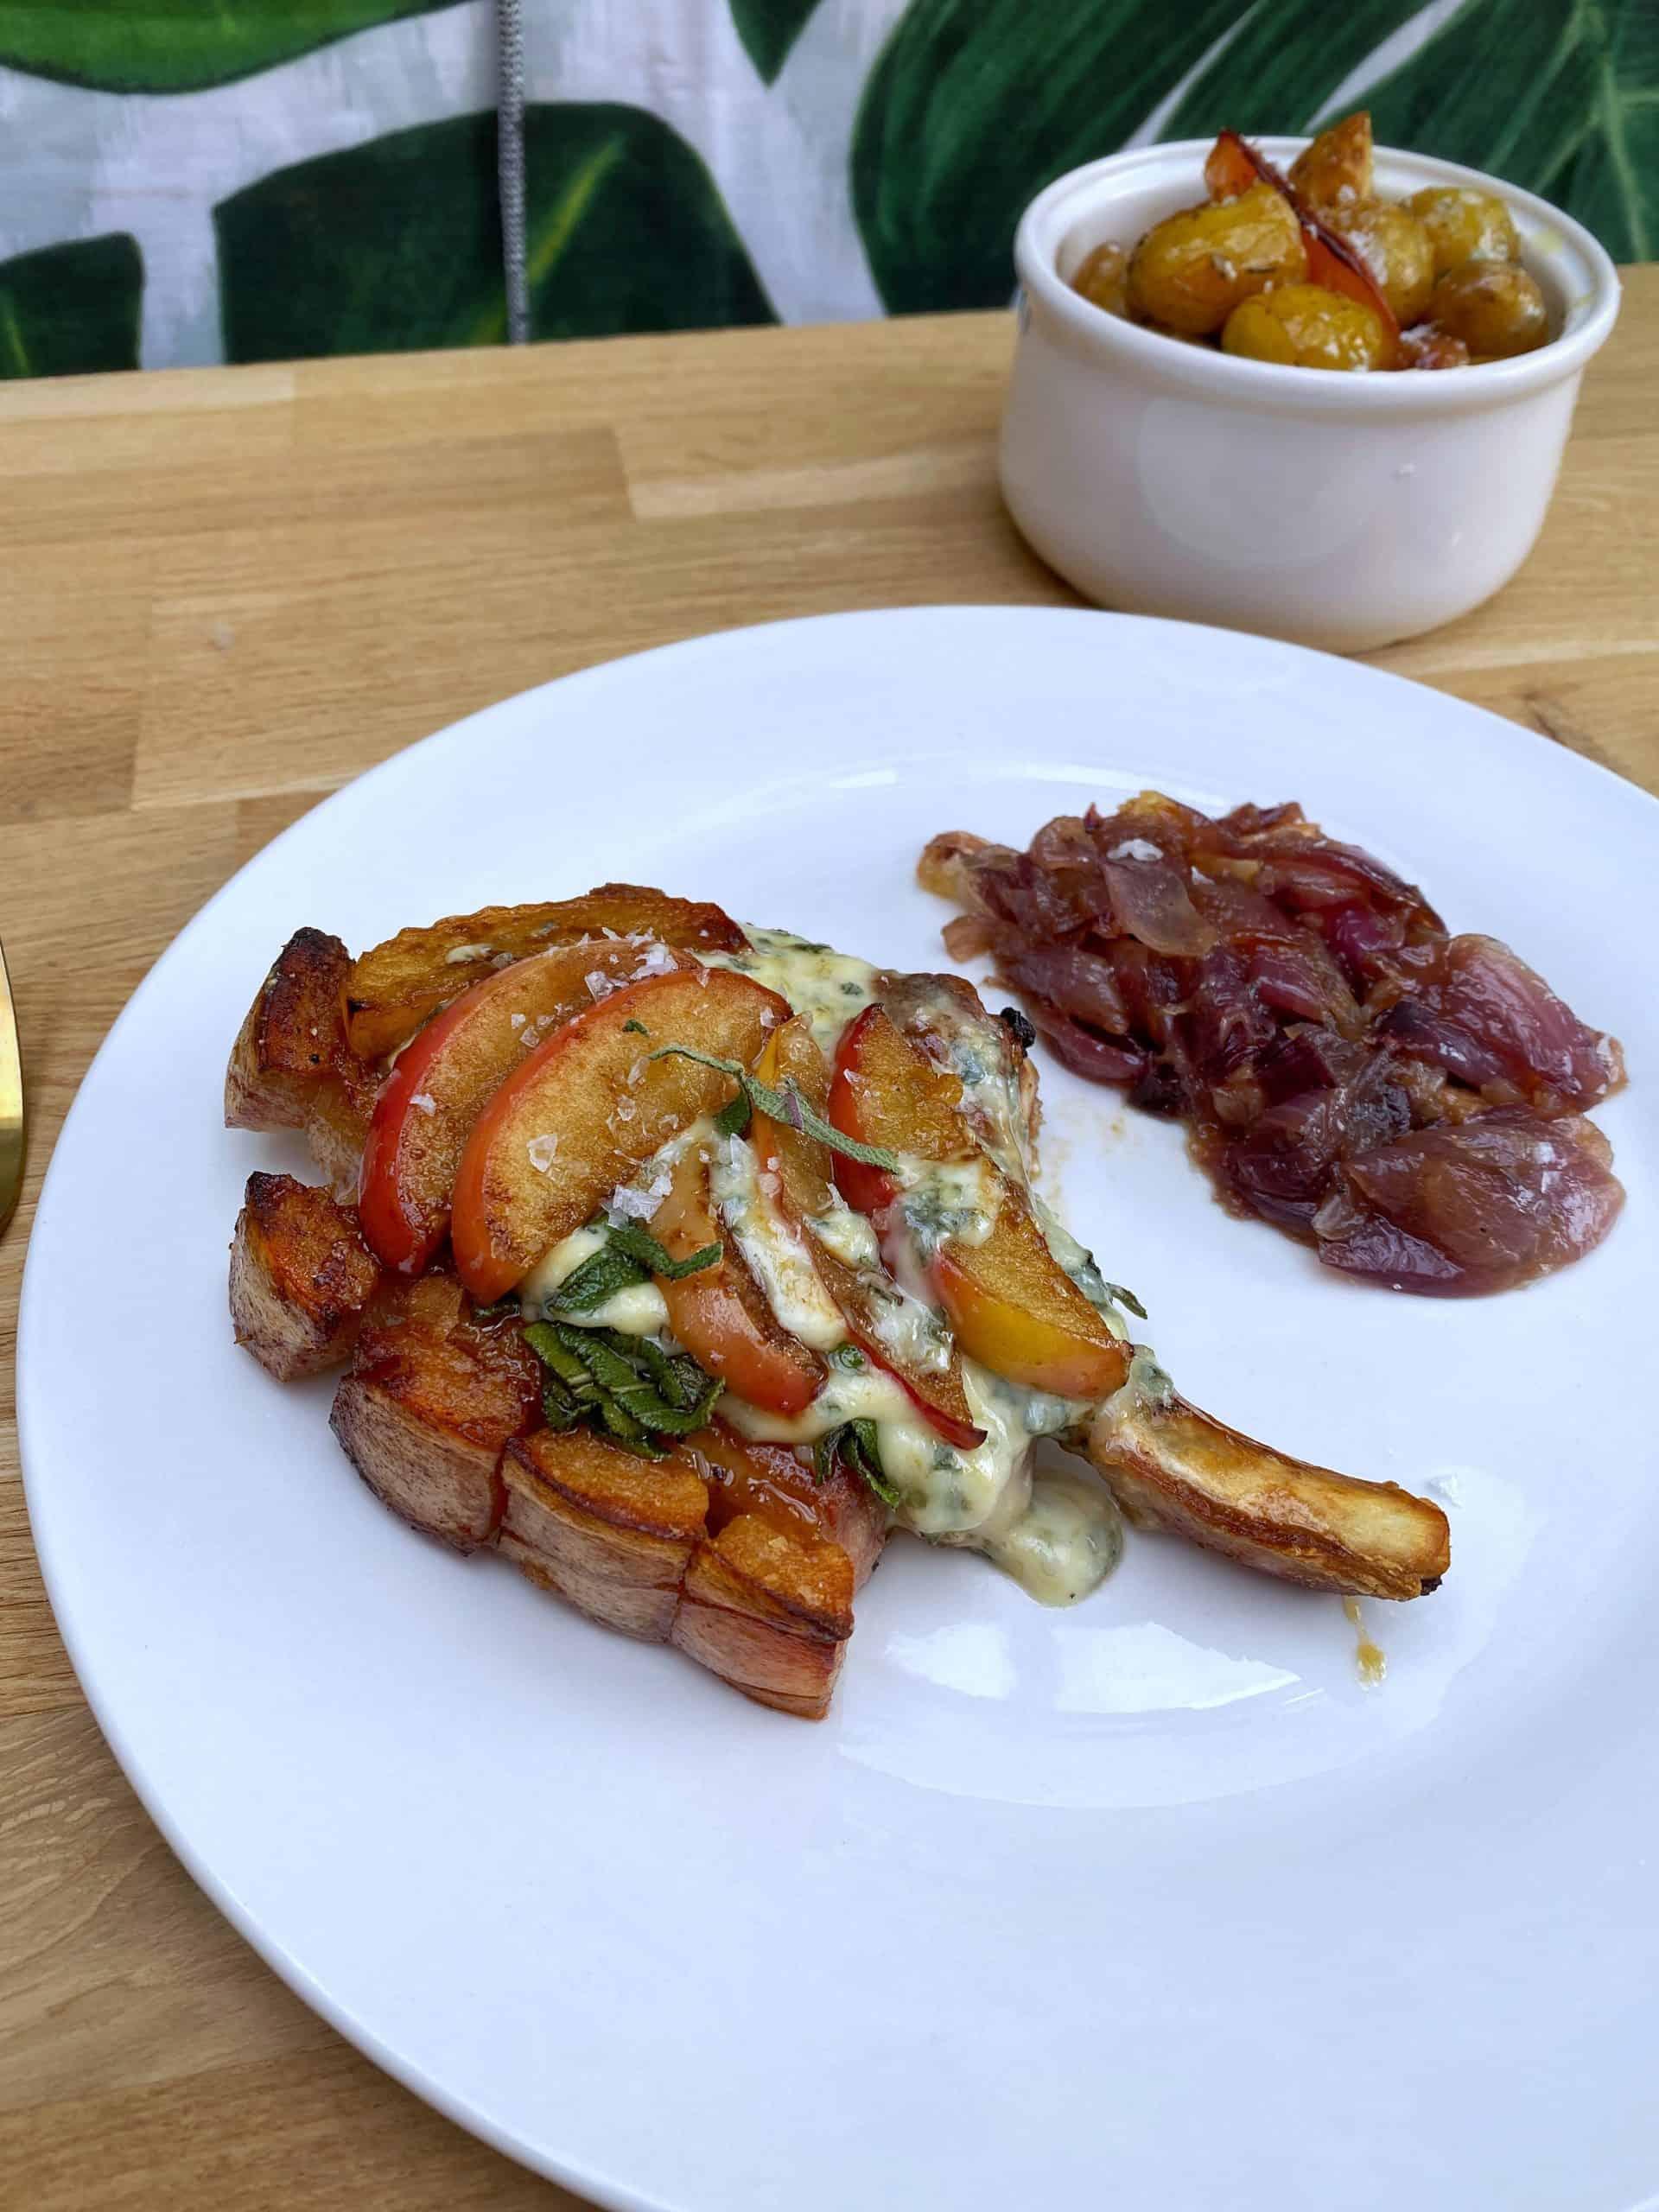 How To Make: Perfect pork chop recipe Jonathan Hatchman